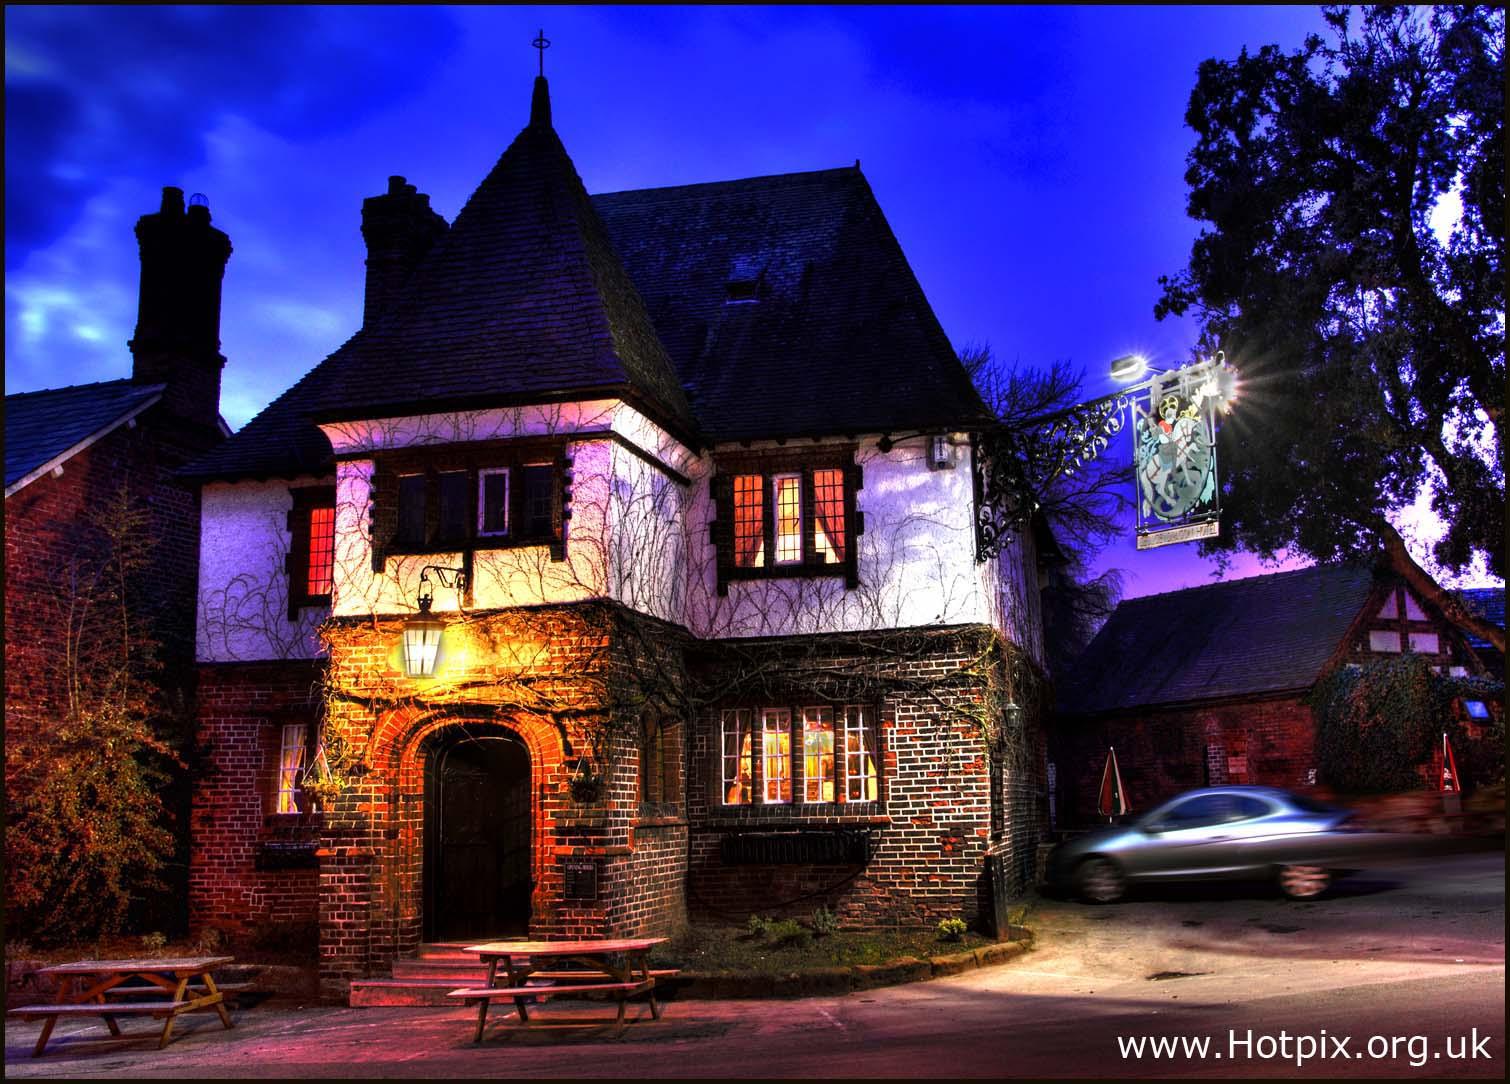 gt,great,budworth,northwich,A49,Cheshire,village,england,english,UK,britain,traditional,pub,public,house,tetley,dusk,night,shot,blue,sky,golden,hour,magic,cast,iron,sign,george,dragon,tonysmith,tony,smith,hotpics,hotpic,hotpick,hotpicks,building,buildings,built,architecture,favourite,pubs,houses,noche,nuit,sex,sexy,hotpix!